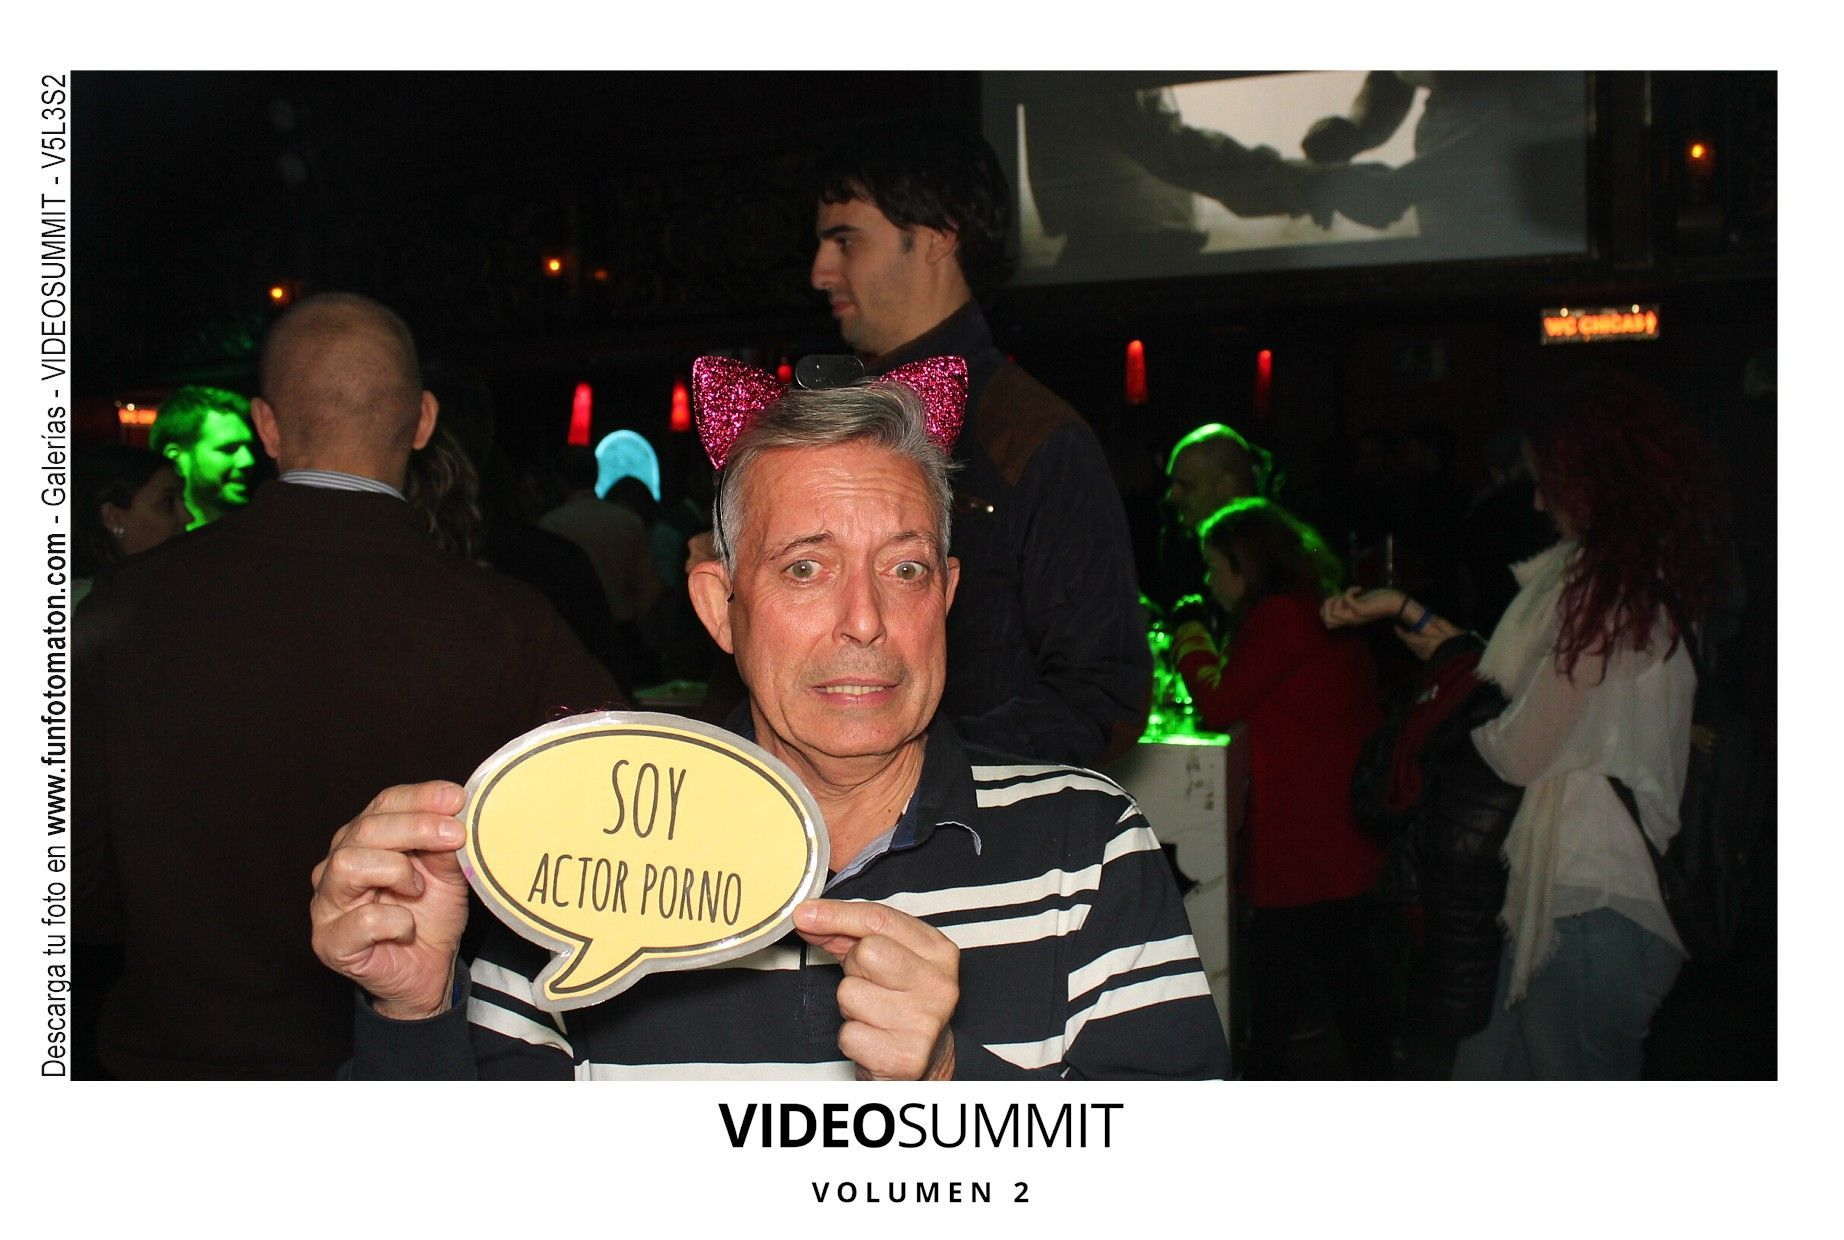 videosummit-vol2-club-party-036